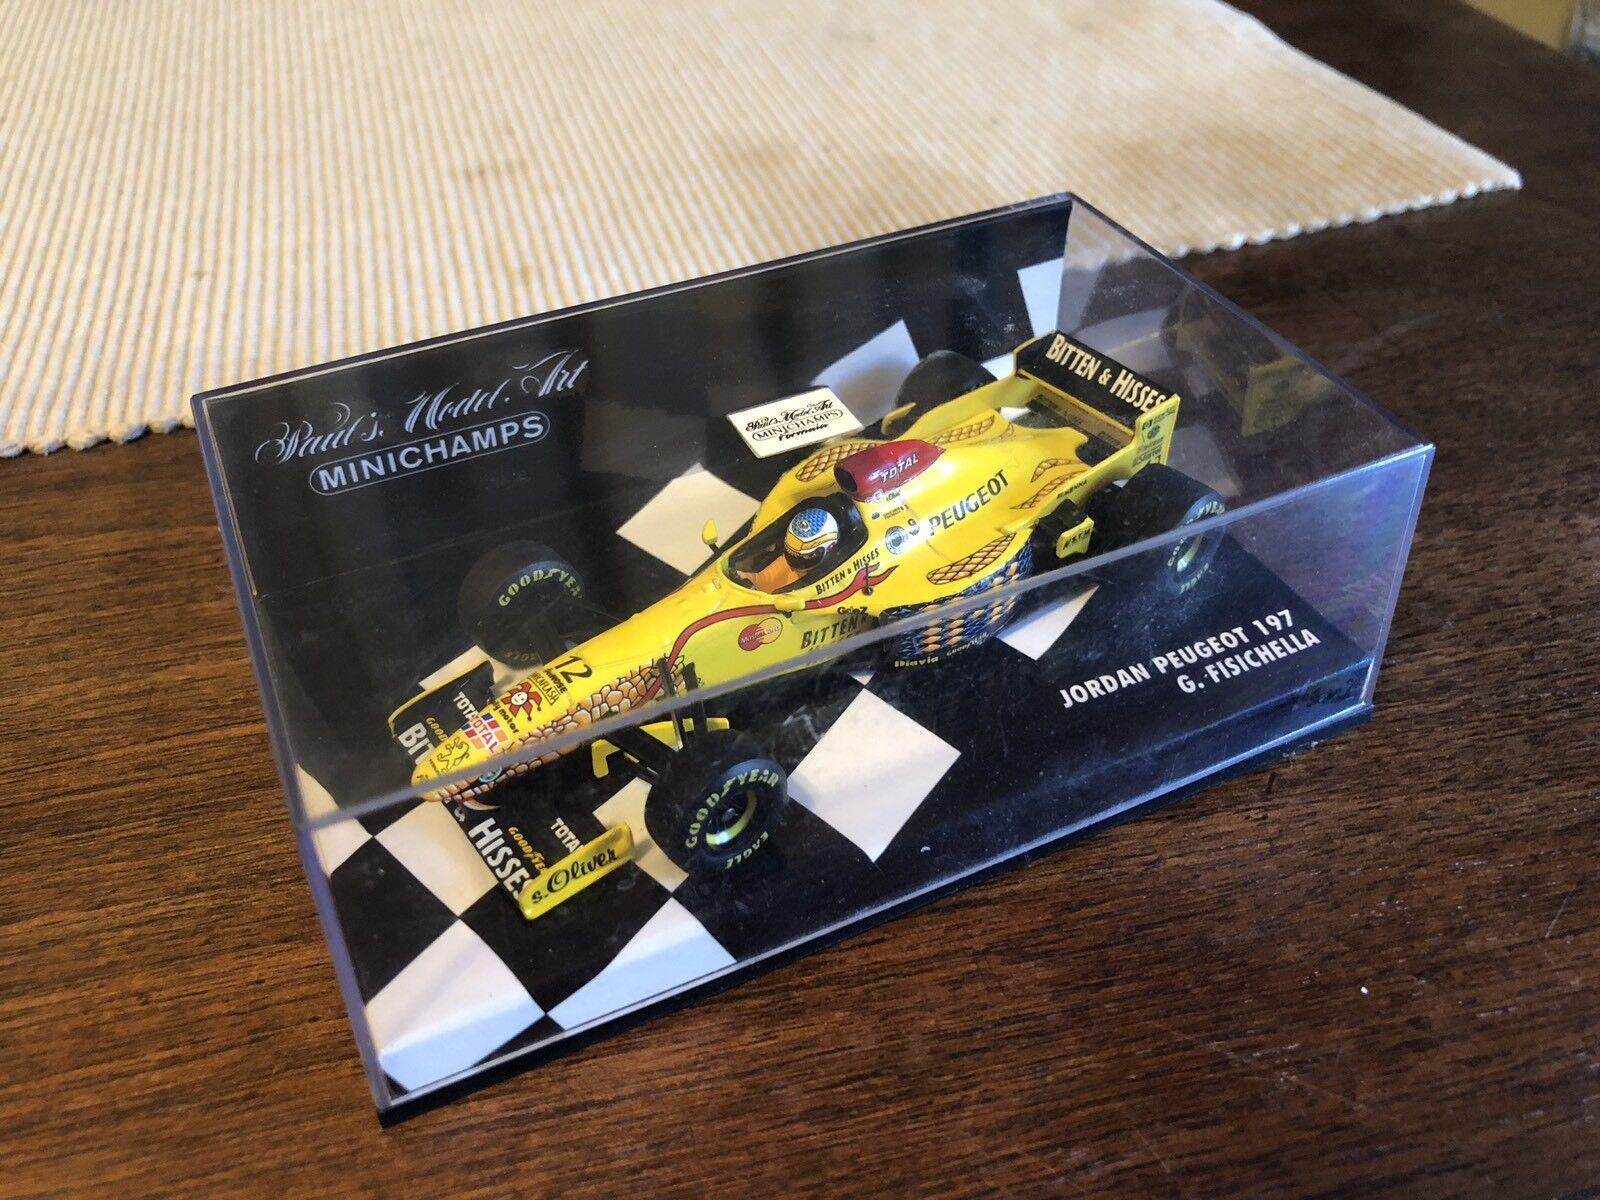 Minichamps Jordan Peugeot Peugeot Peugeot 197 Fisichella Formula 1 6a463c